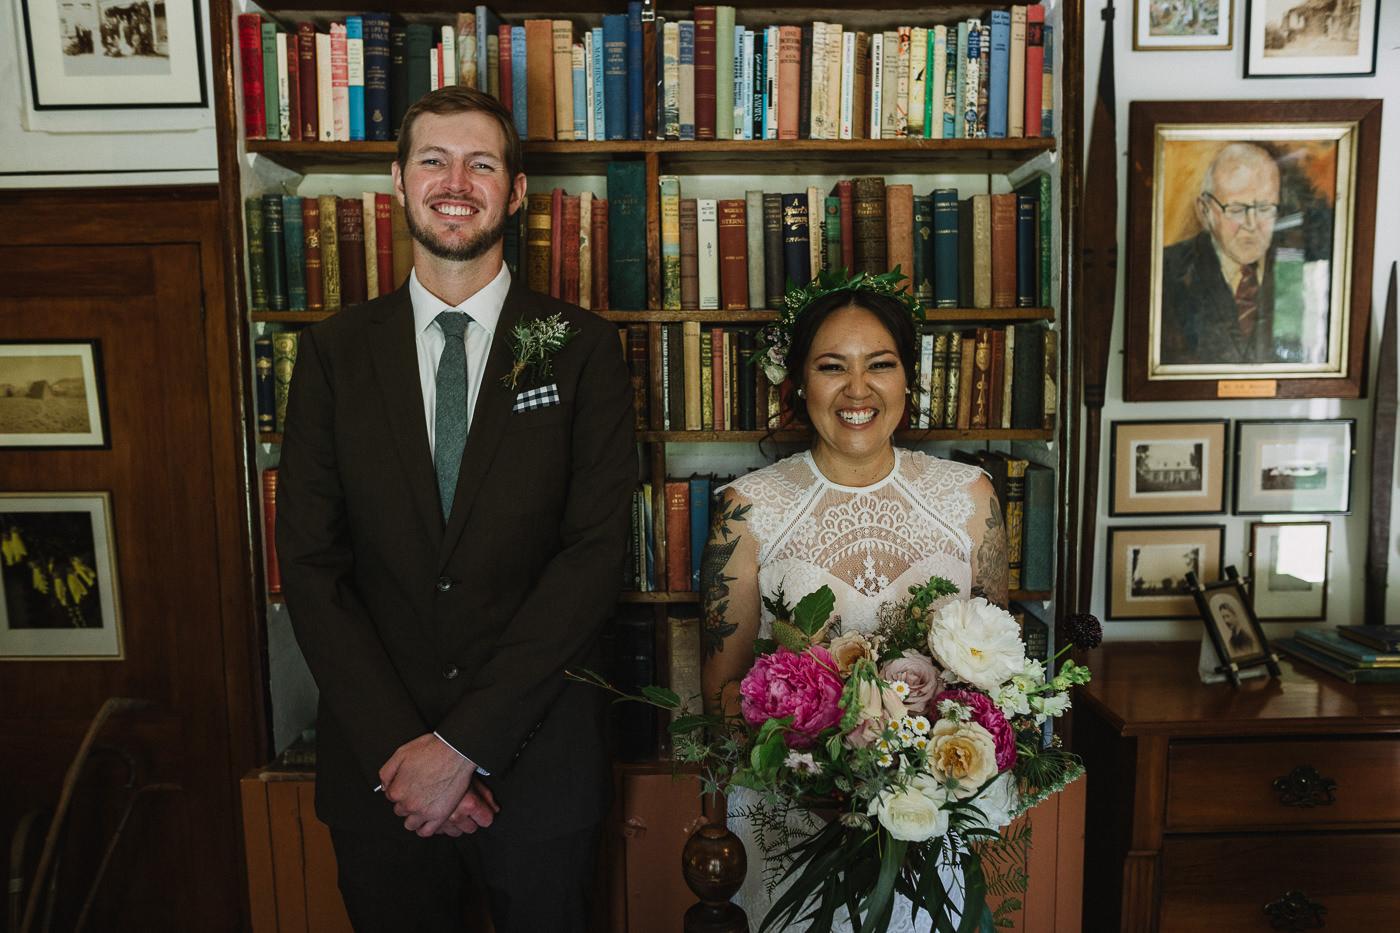 kj-1049c_The_Elms_wedding_photos_tauranga